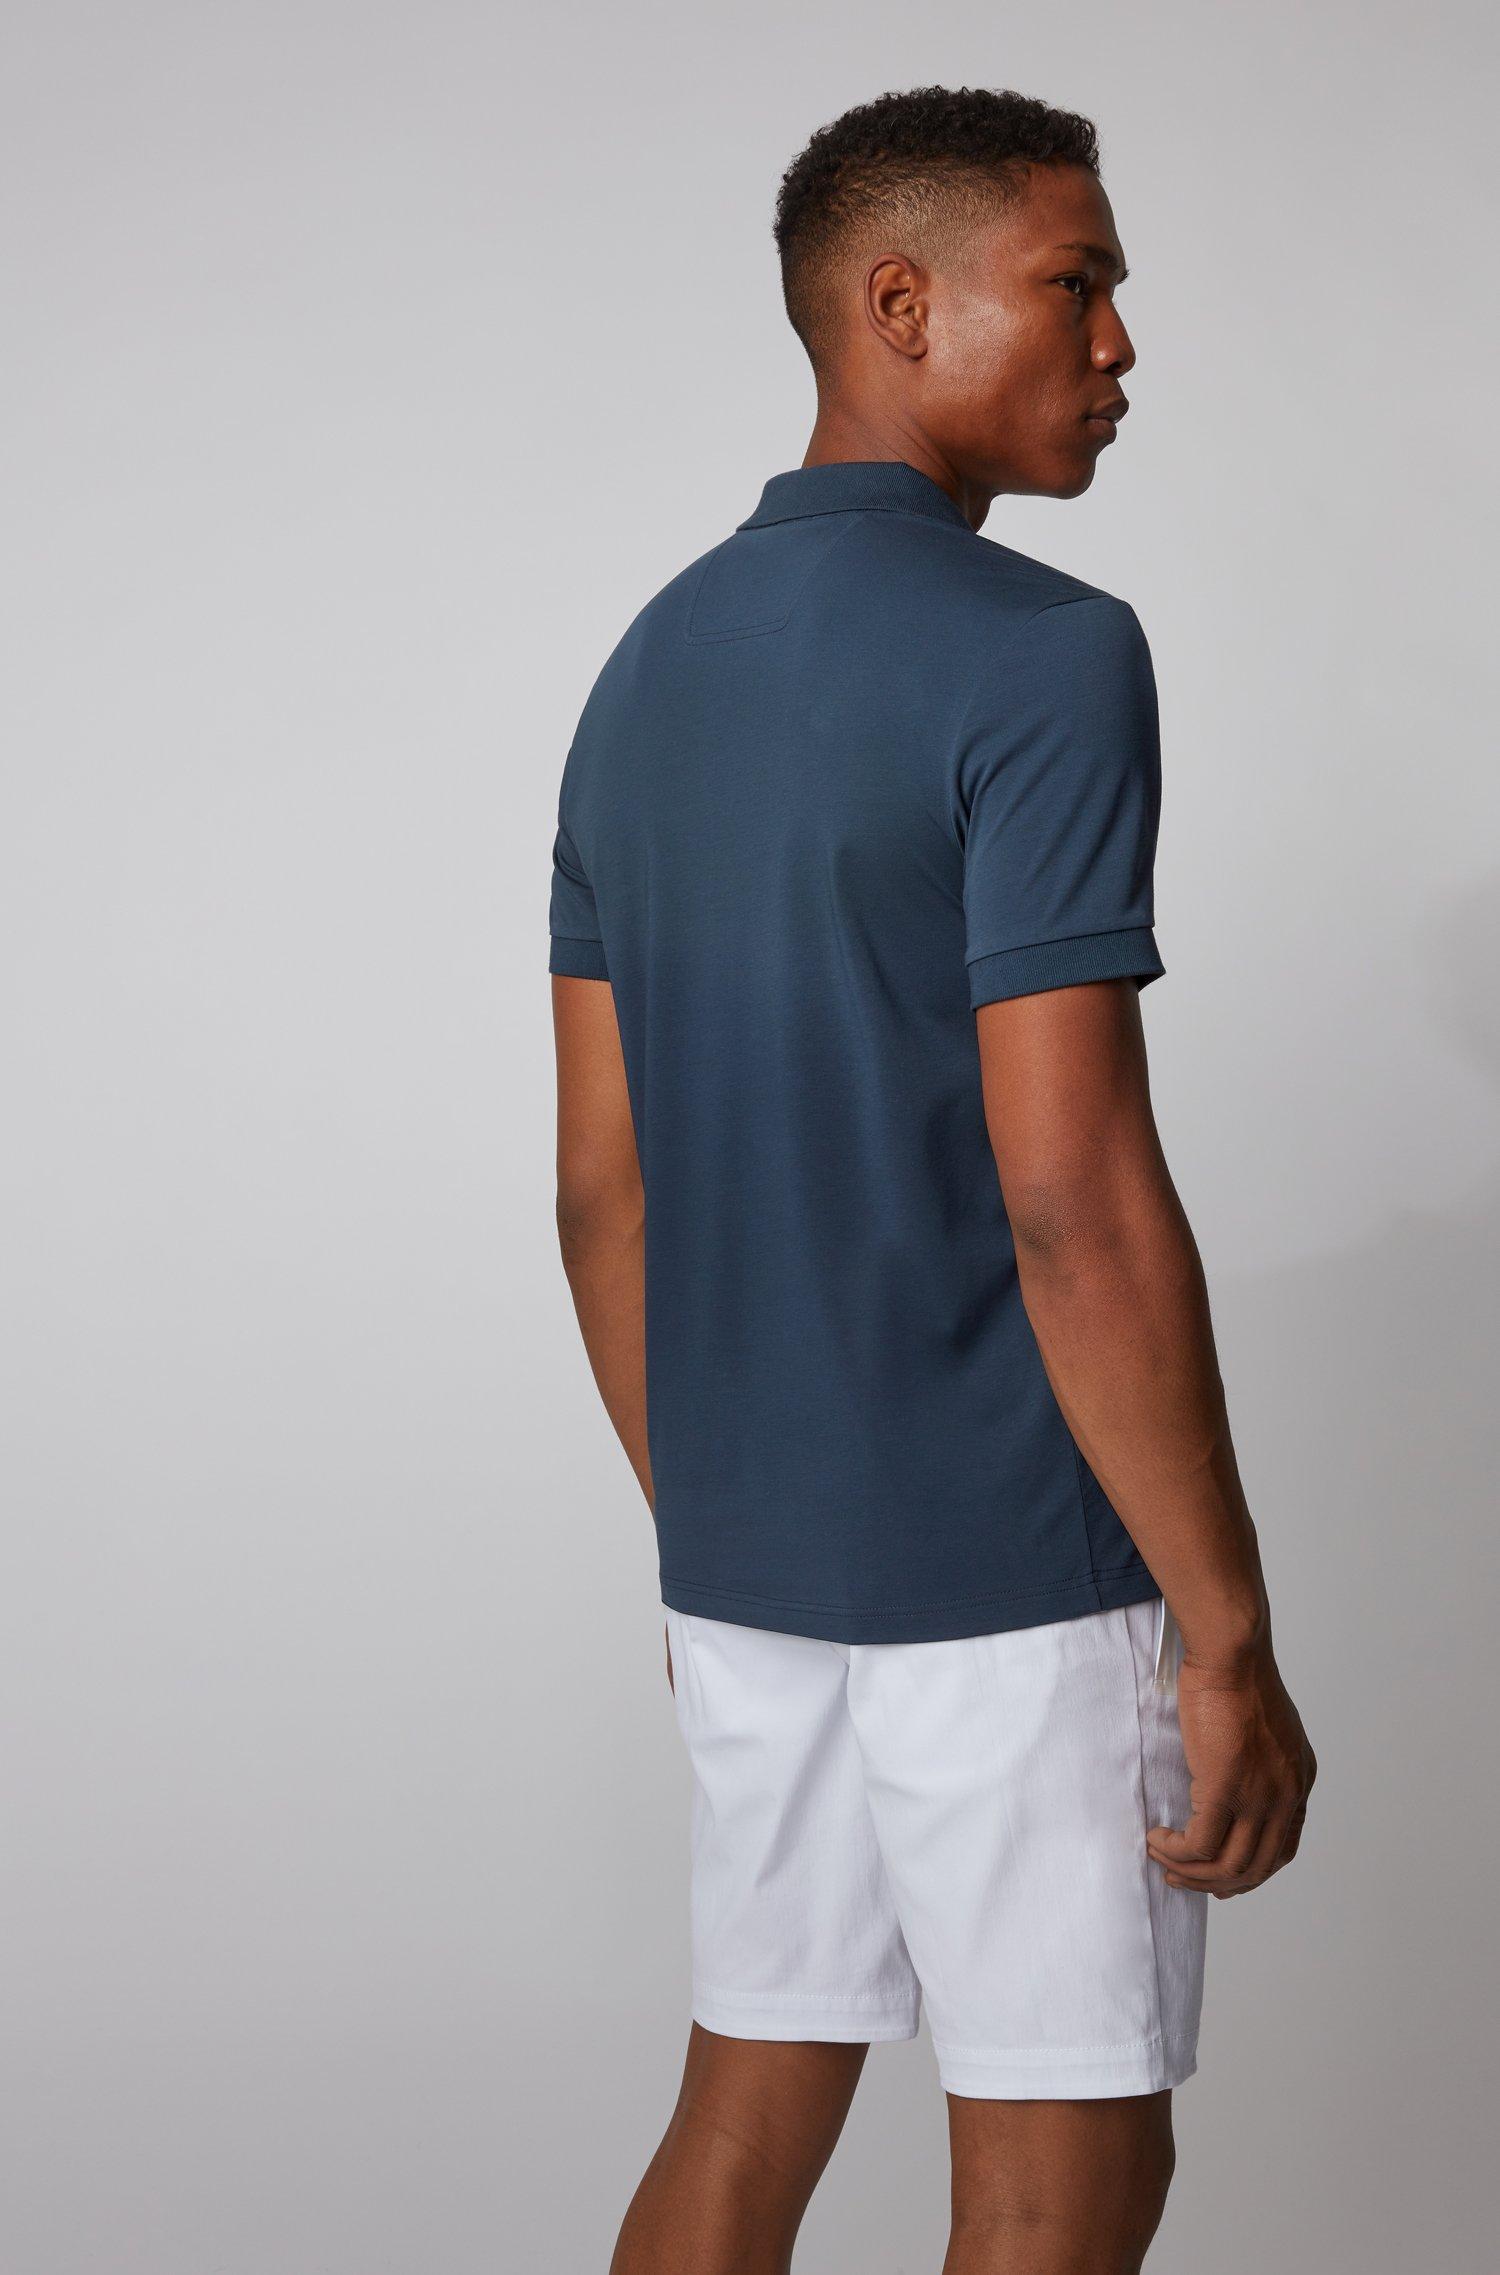 pavel Polo in misto cotone con logo curvo in rete - navy BOSS   Polo   50430642410